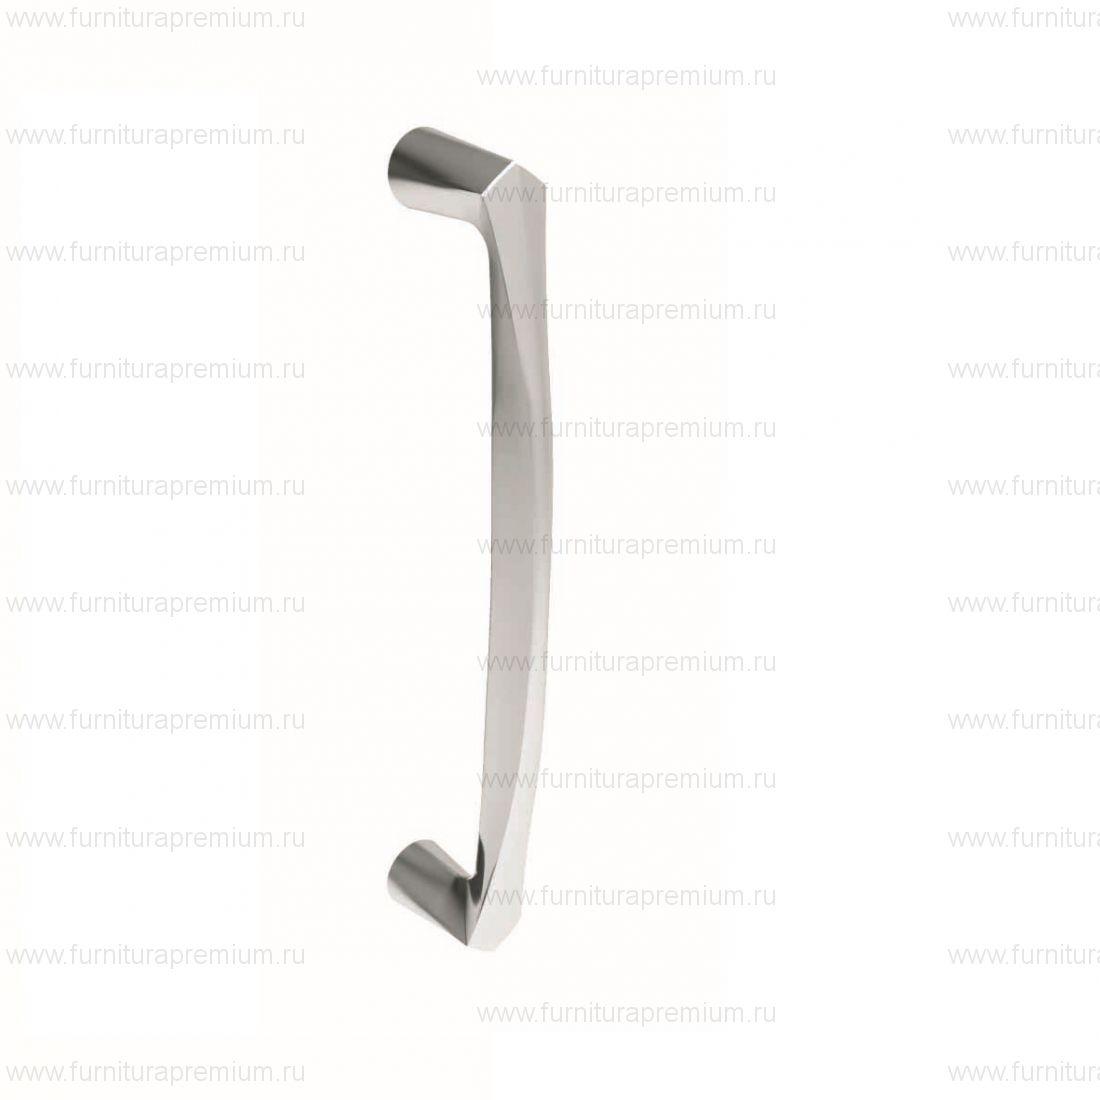 Ручка-скоба Enrico Cassina Huang C07950. Длина 275 мм.